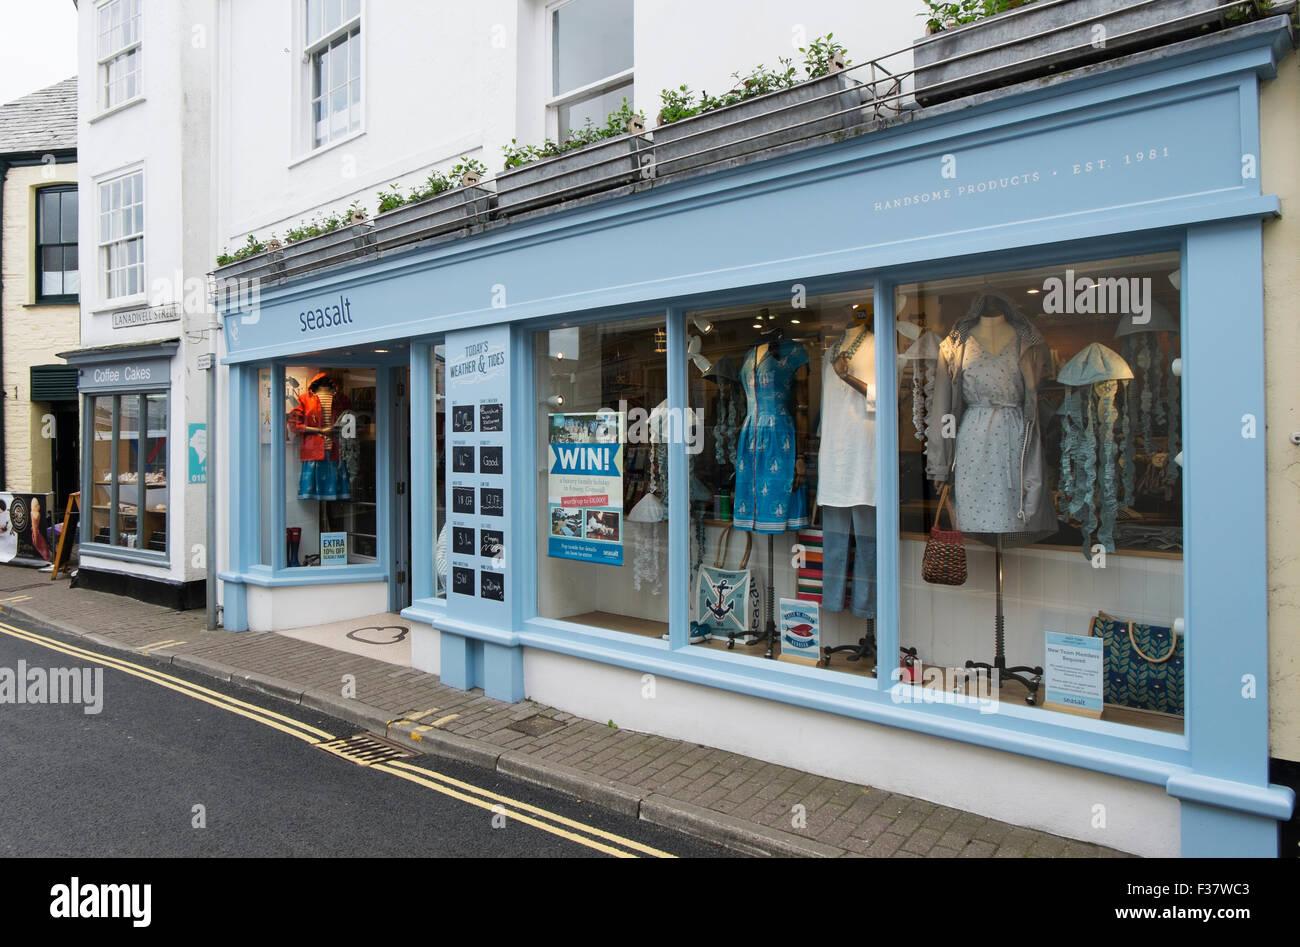 Seasalt clothes shop Padstow Cornwall UK. Stock Photo